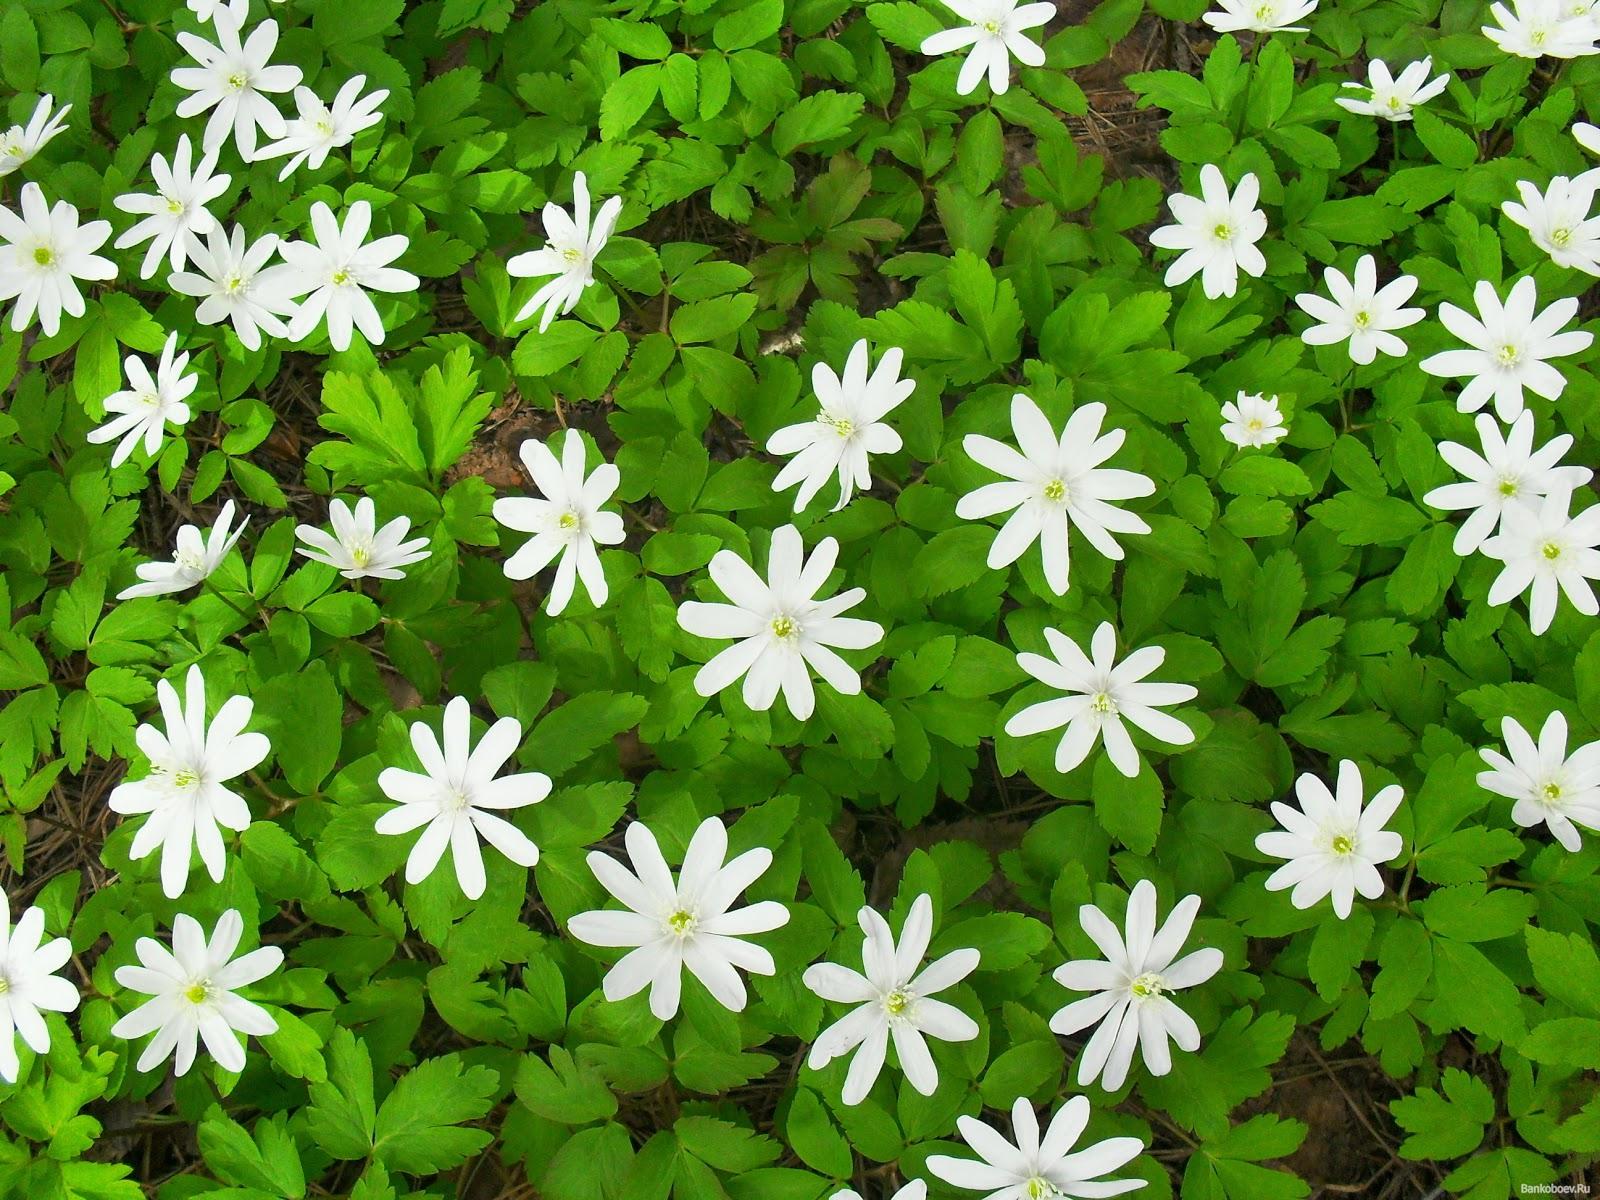 Wallpapernarium: Flores Blancas